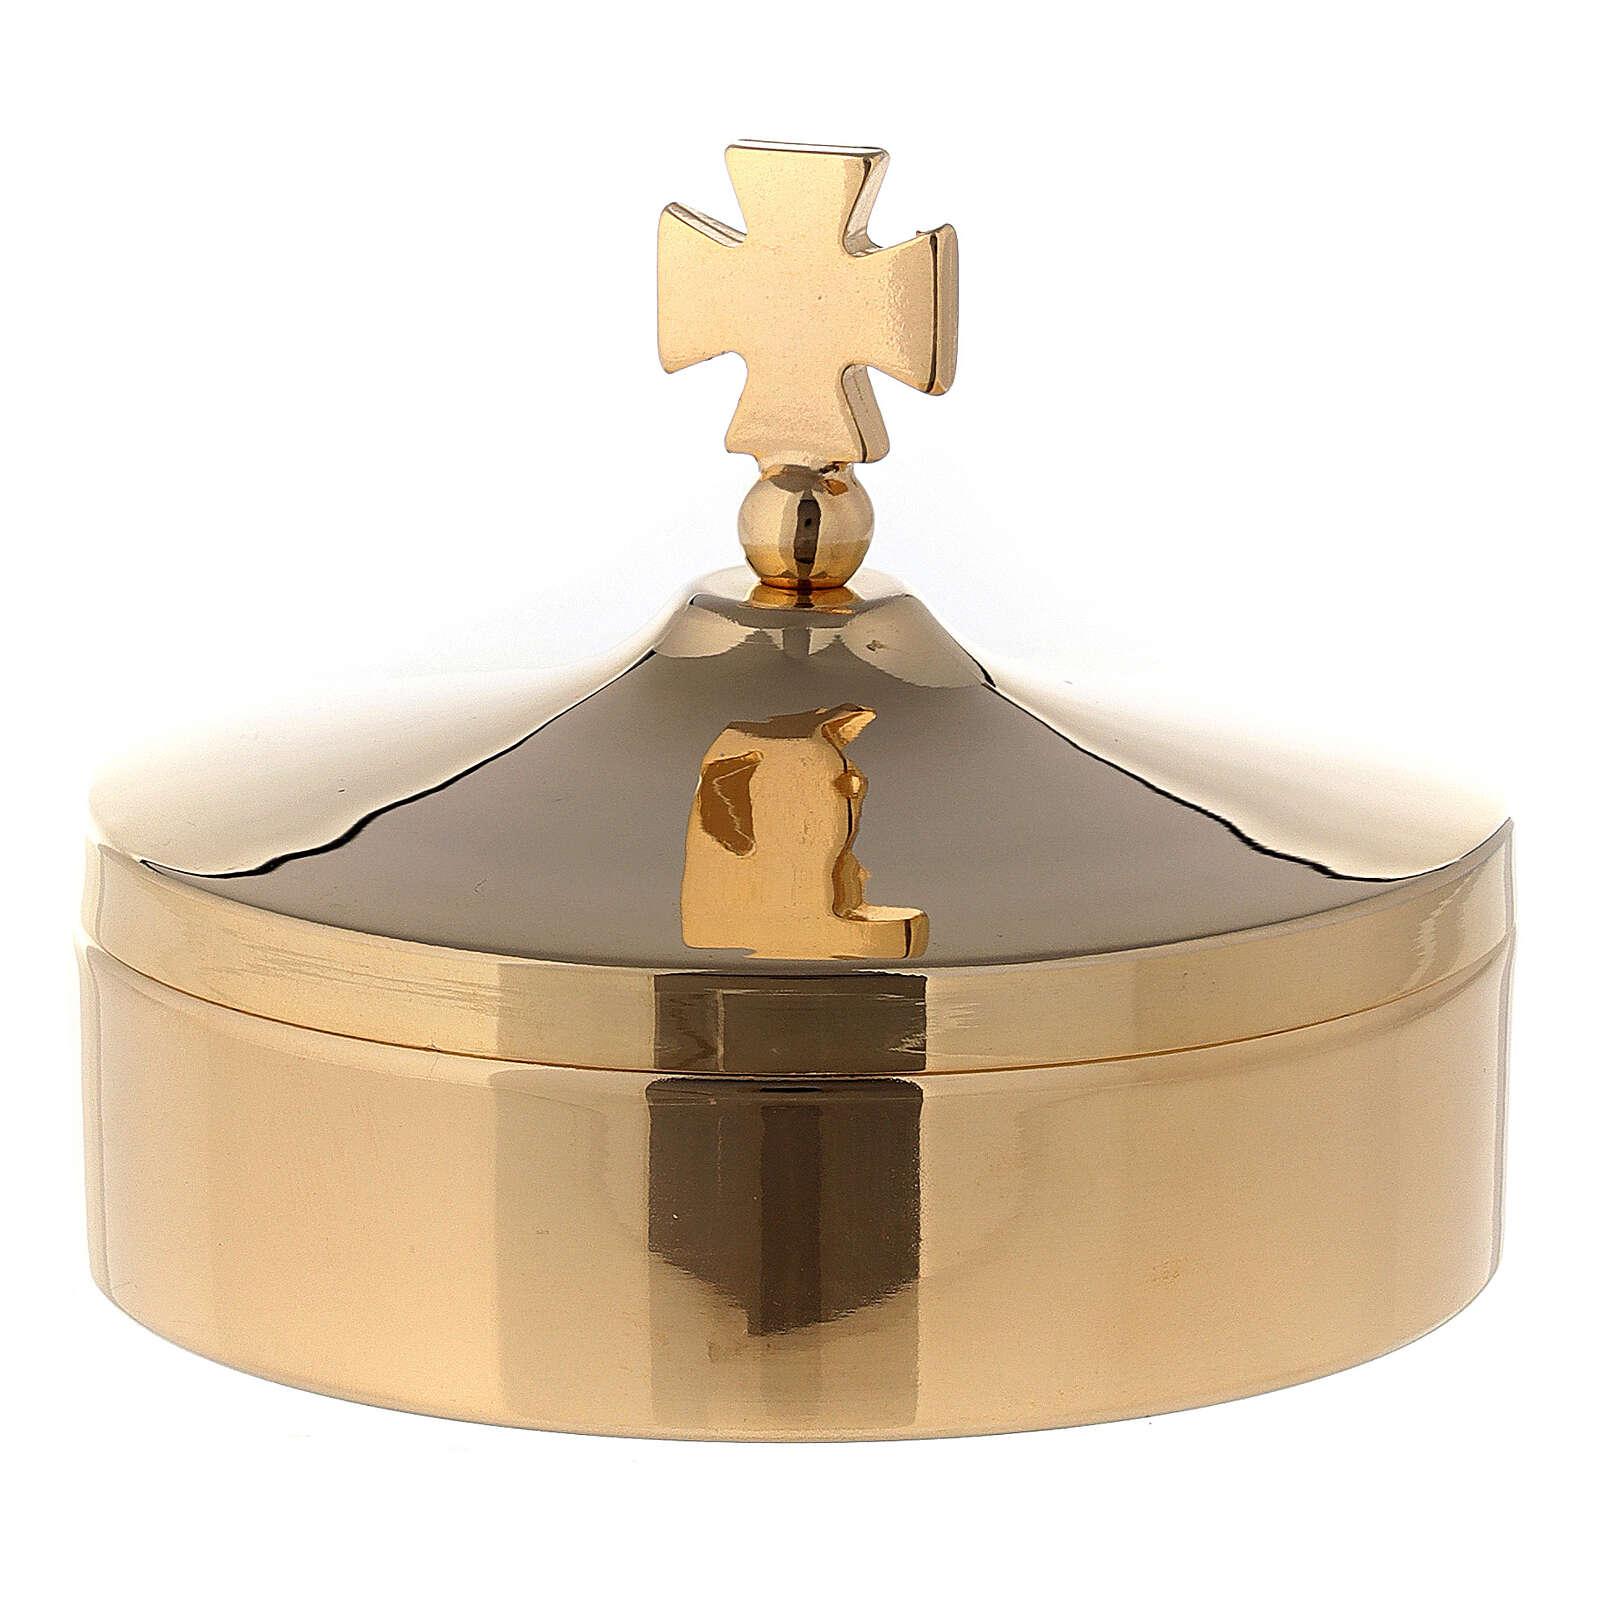 Custode hosties diam. 8 cm en laiton doré brillant 24K 3